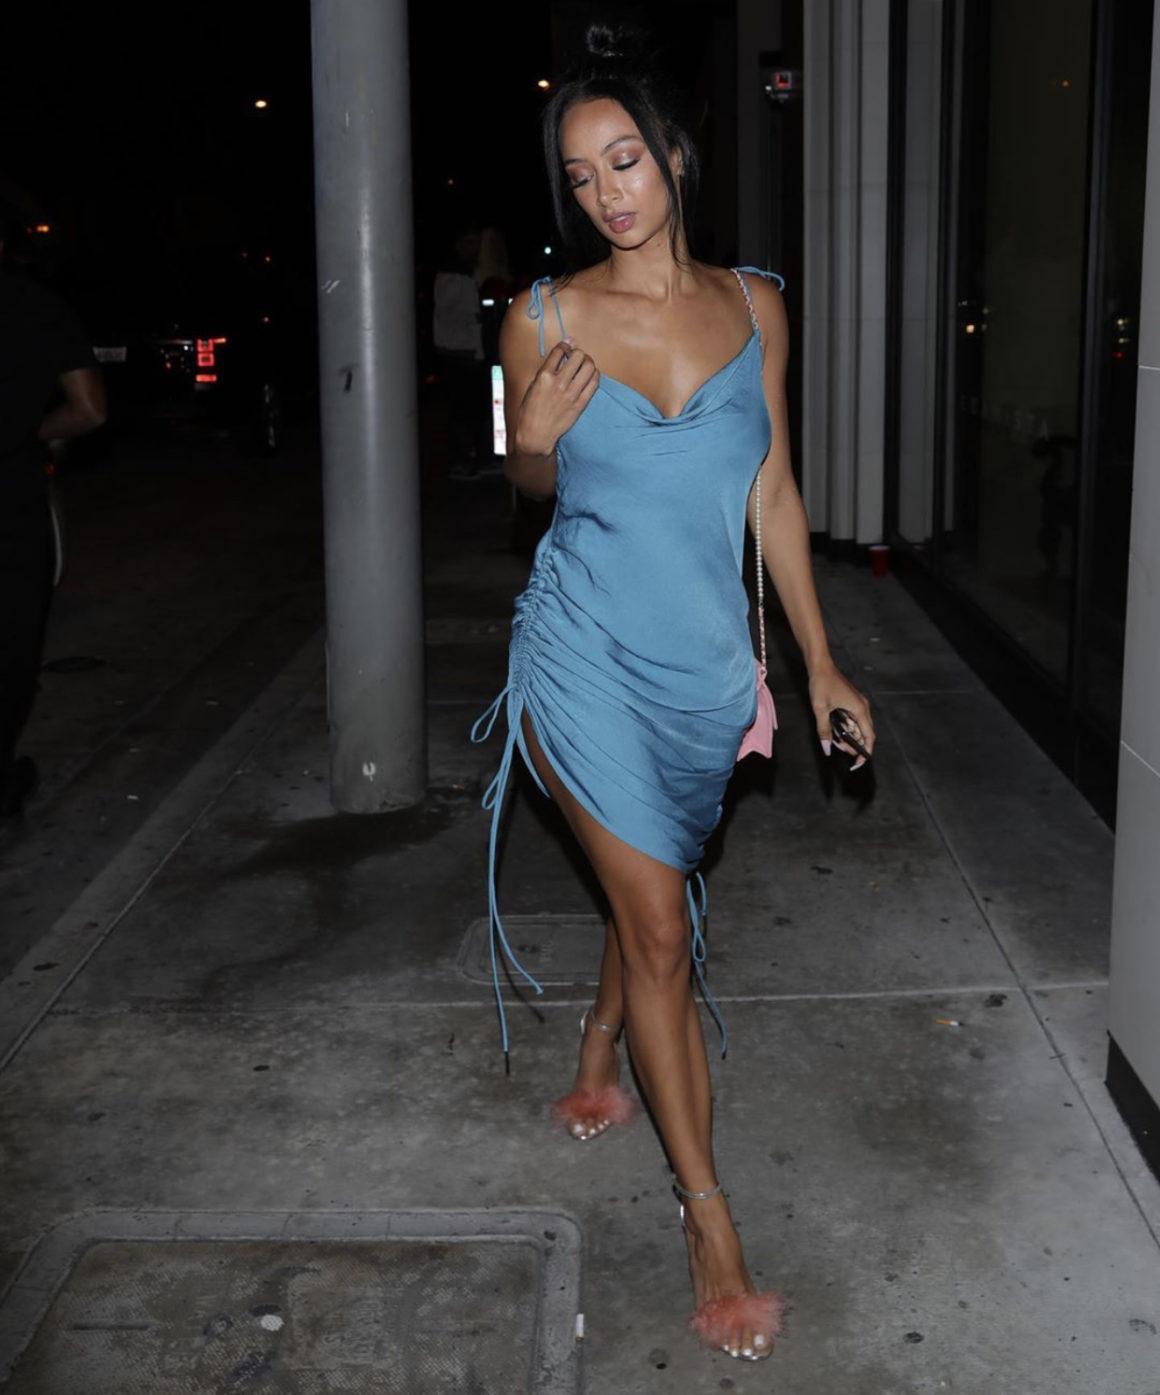 dress midi dress silk satin dress draya michele celebrity summer dress